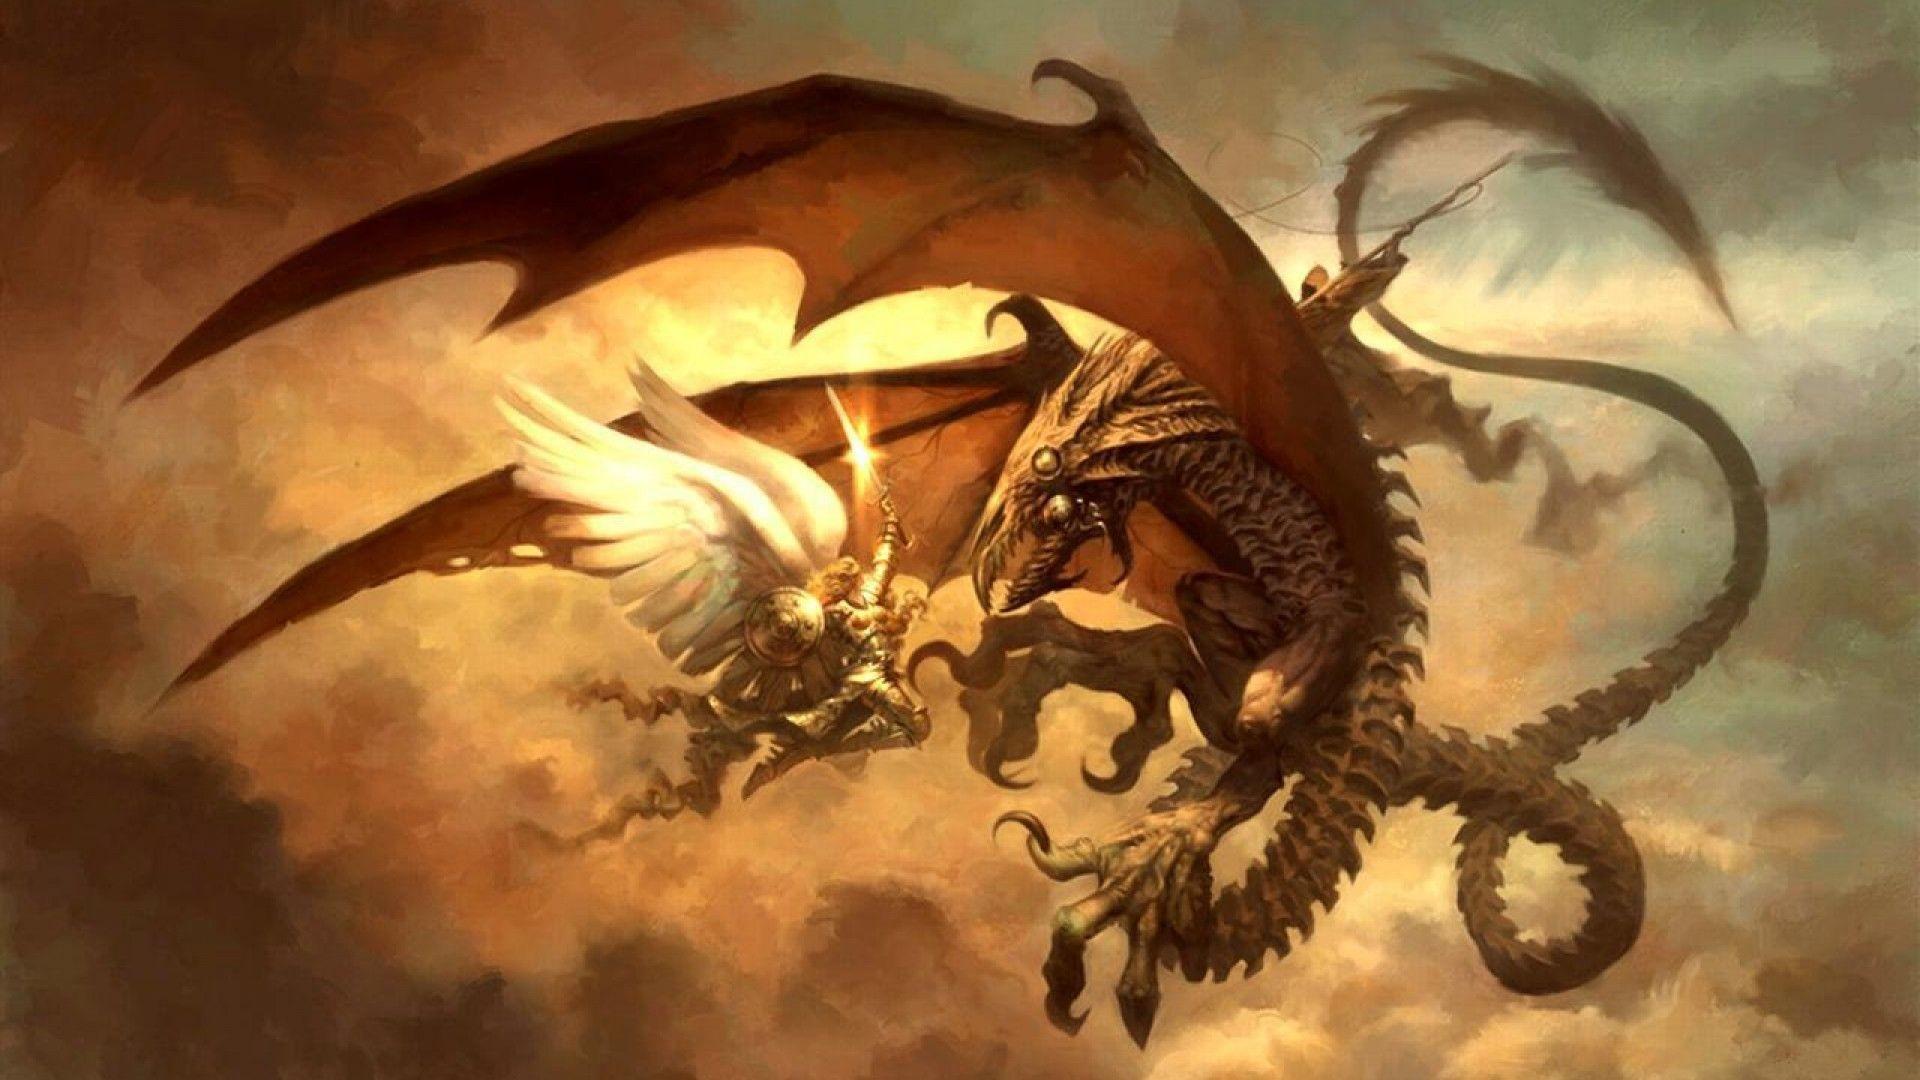 Fire Dragon HD desktop wallpaper : Widescreen : High Definition 1024×768 Dragon  HD Wallpapers